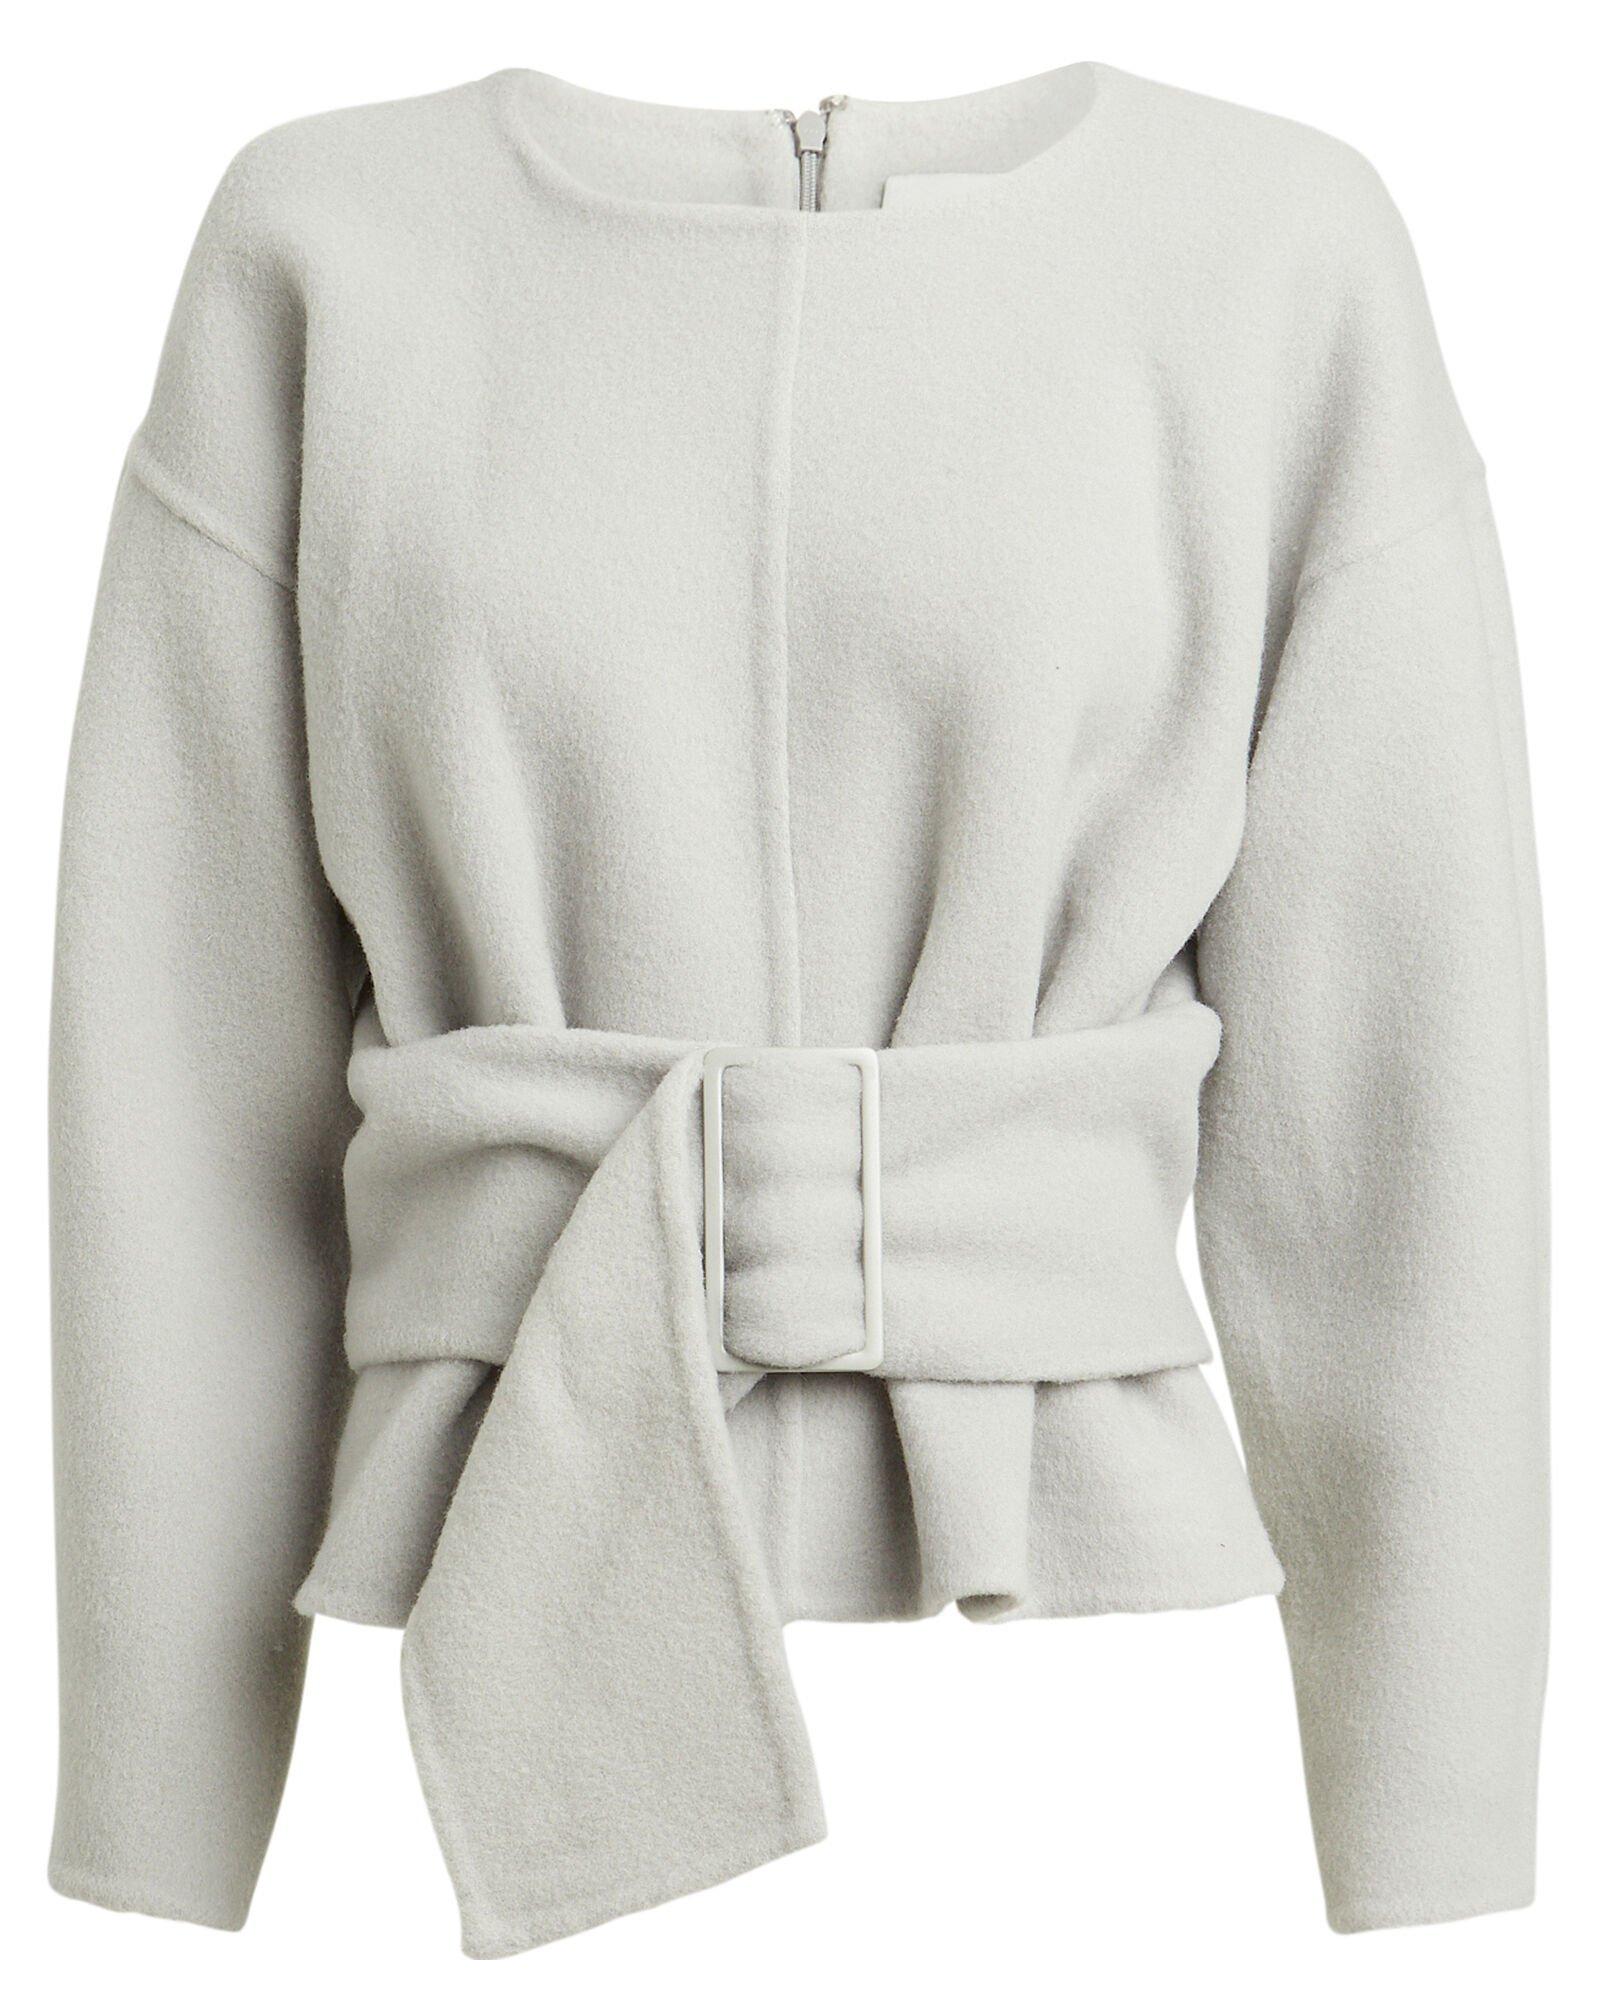 3.1 Phillip Lim | Belted Wool-Blend Sweater | INTERMIX®